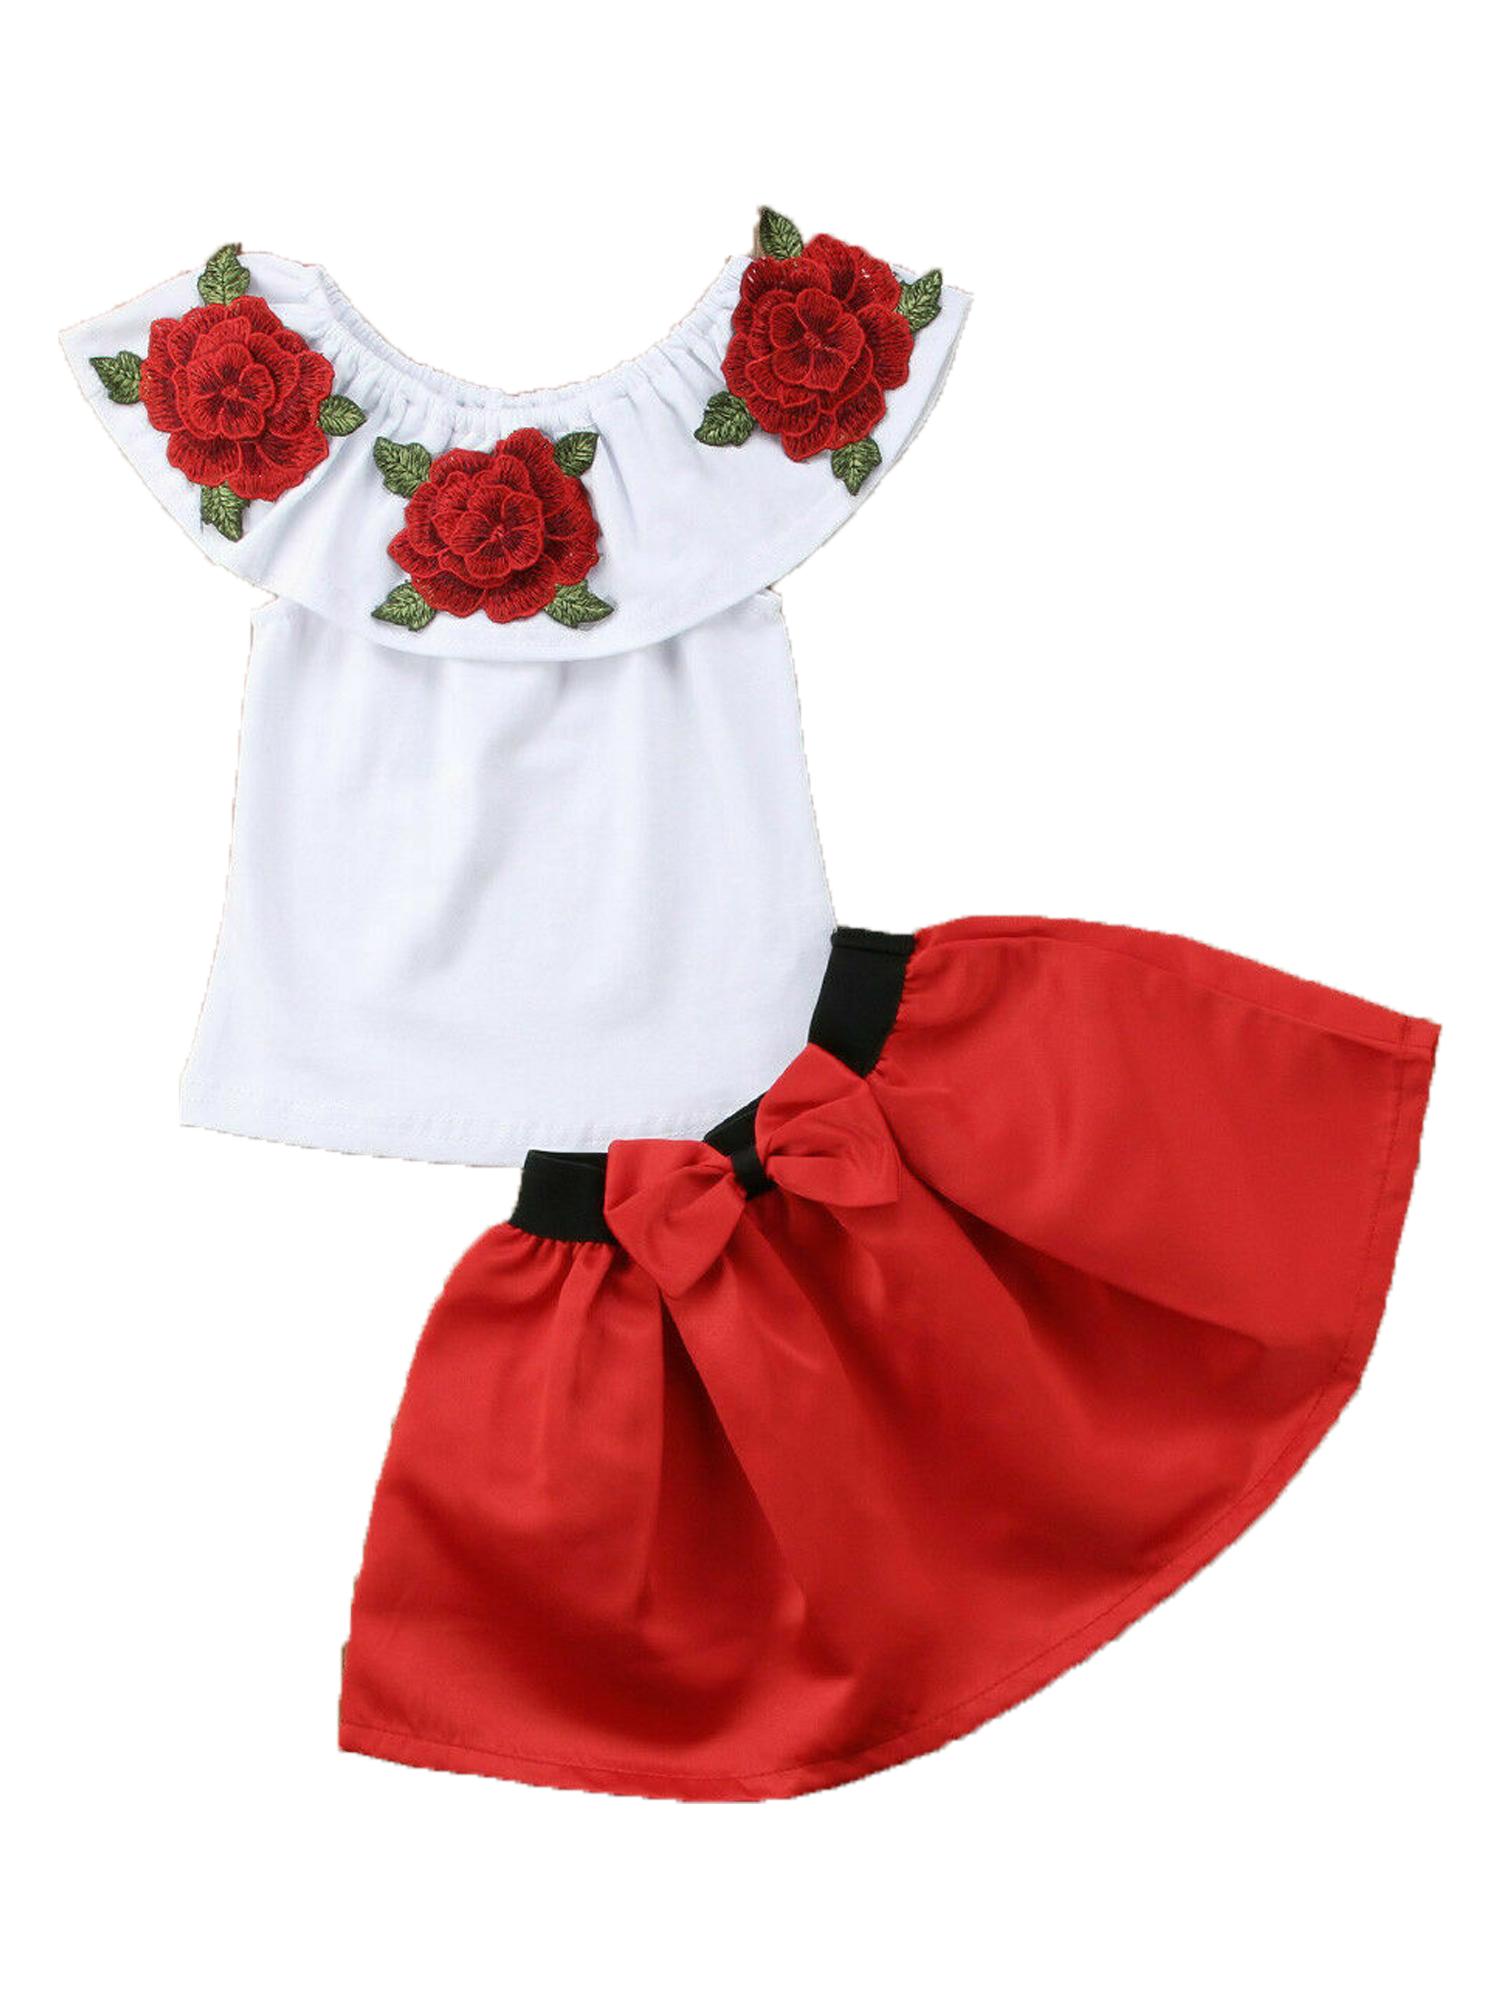 Toddler Kids Baby Girls Off Shoulder Tops Mini Skirt Dress Outfits Set Clothes